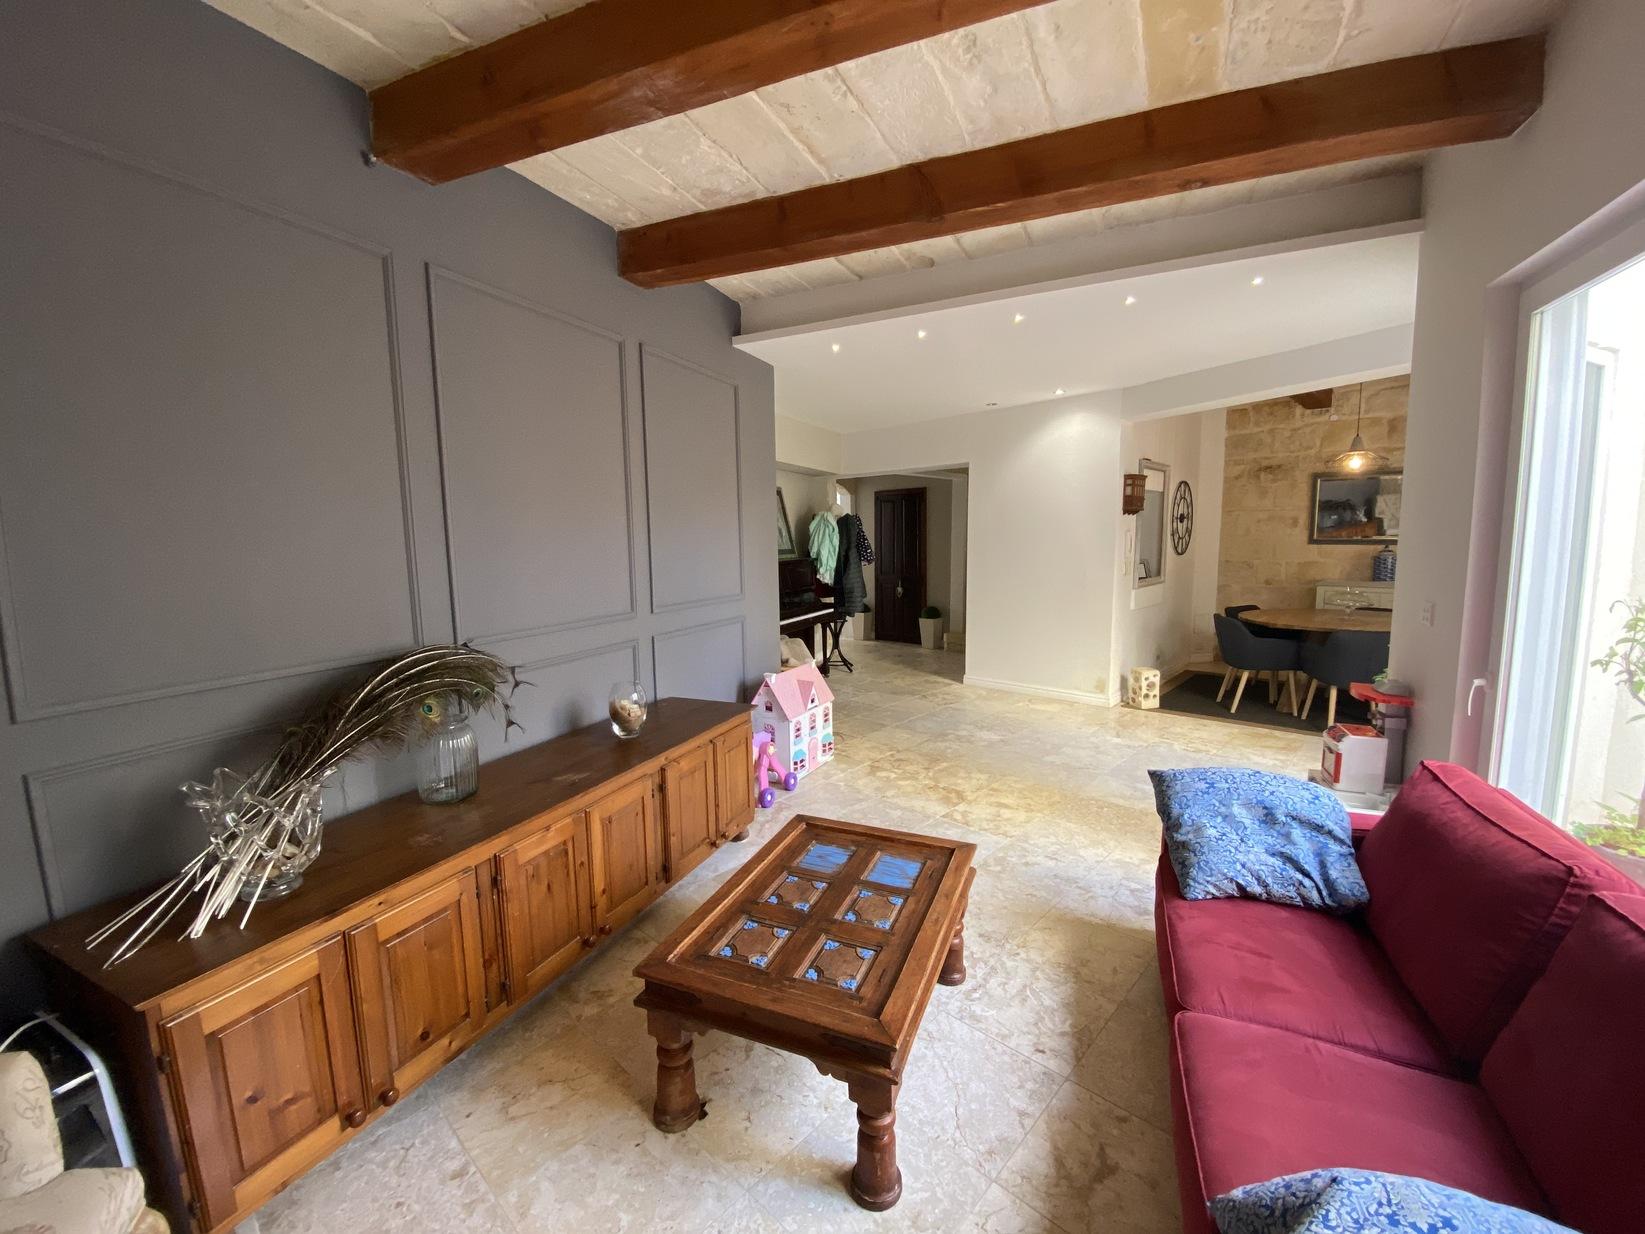 3 bed Town House For Rent in Lija, Lija - thumb 3